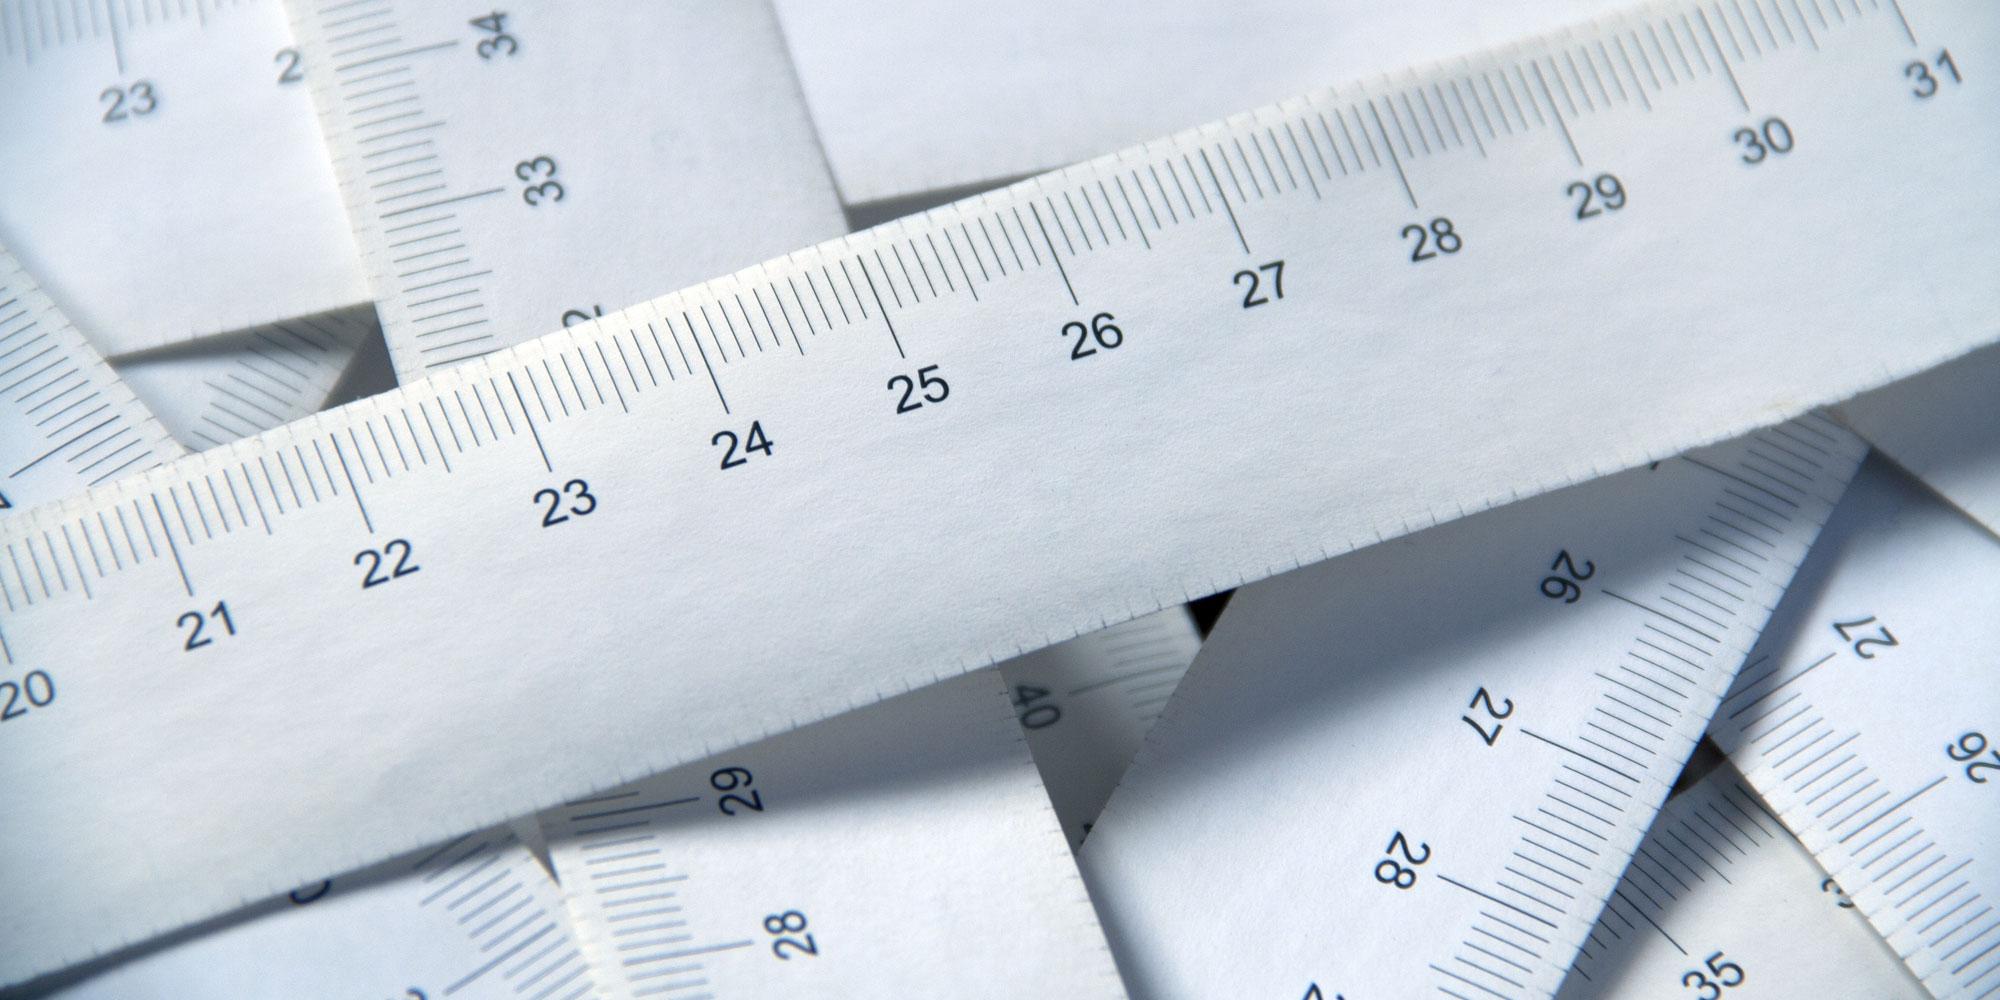 Measuring units